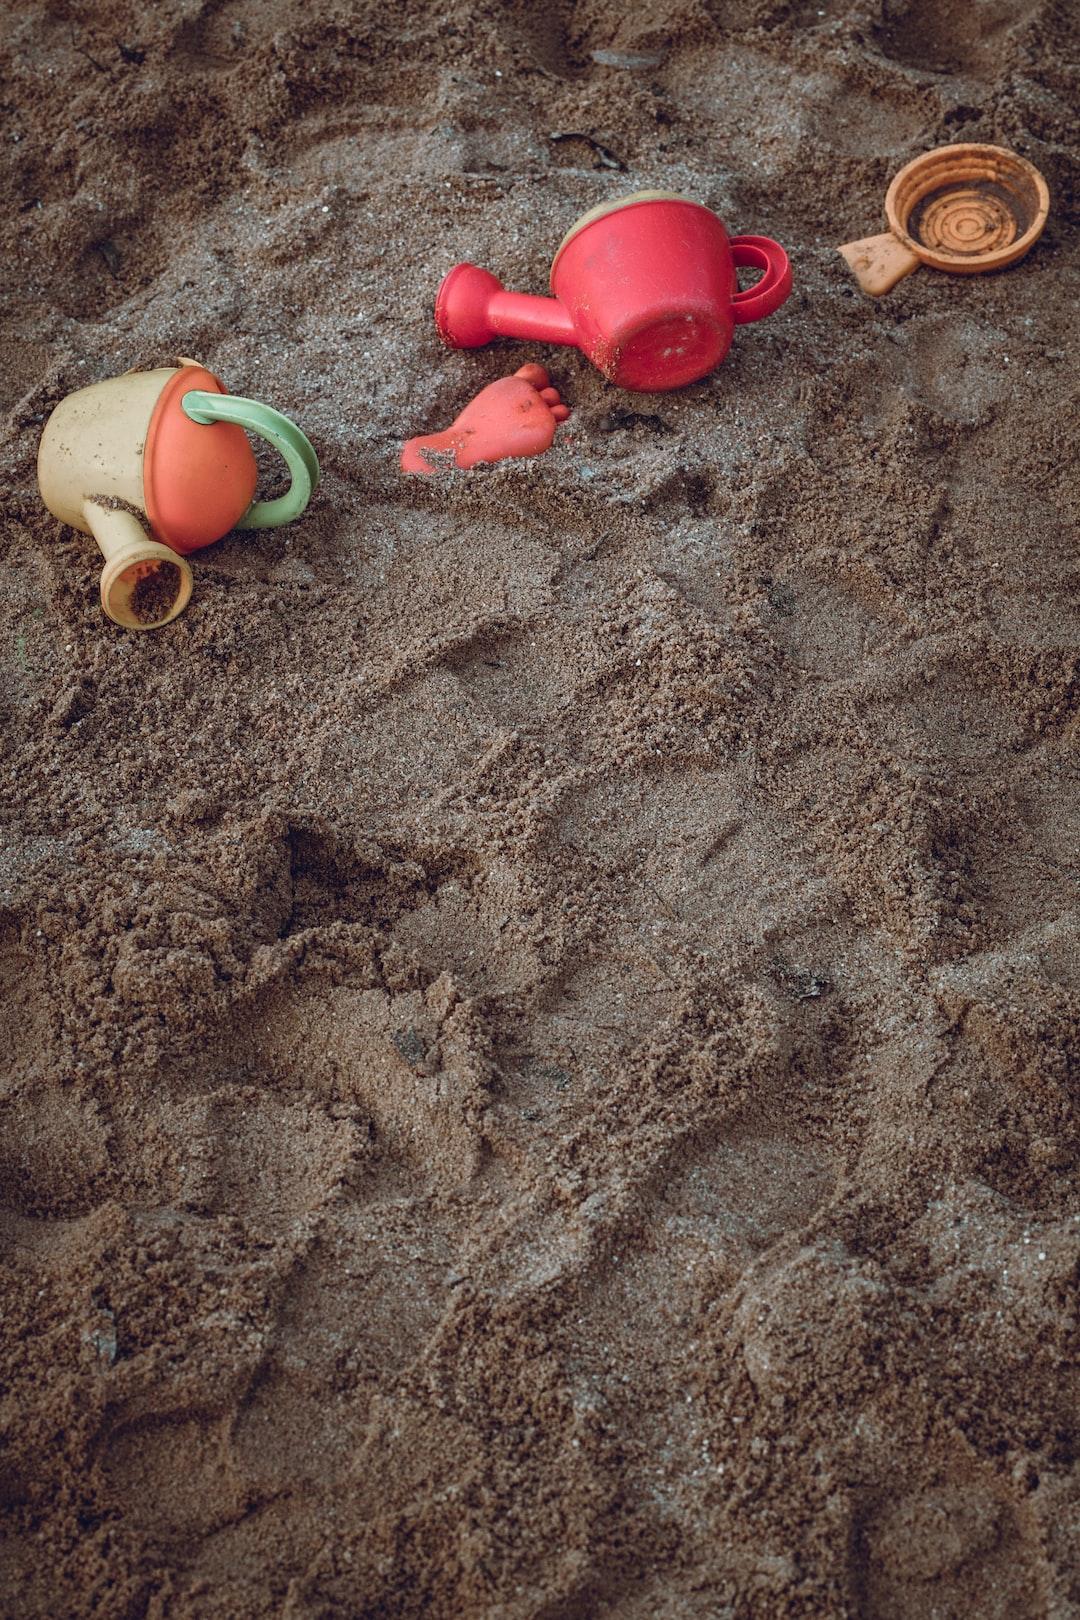 Sandbox nursery school childhood